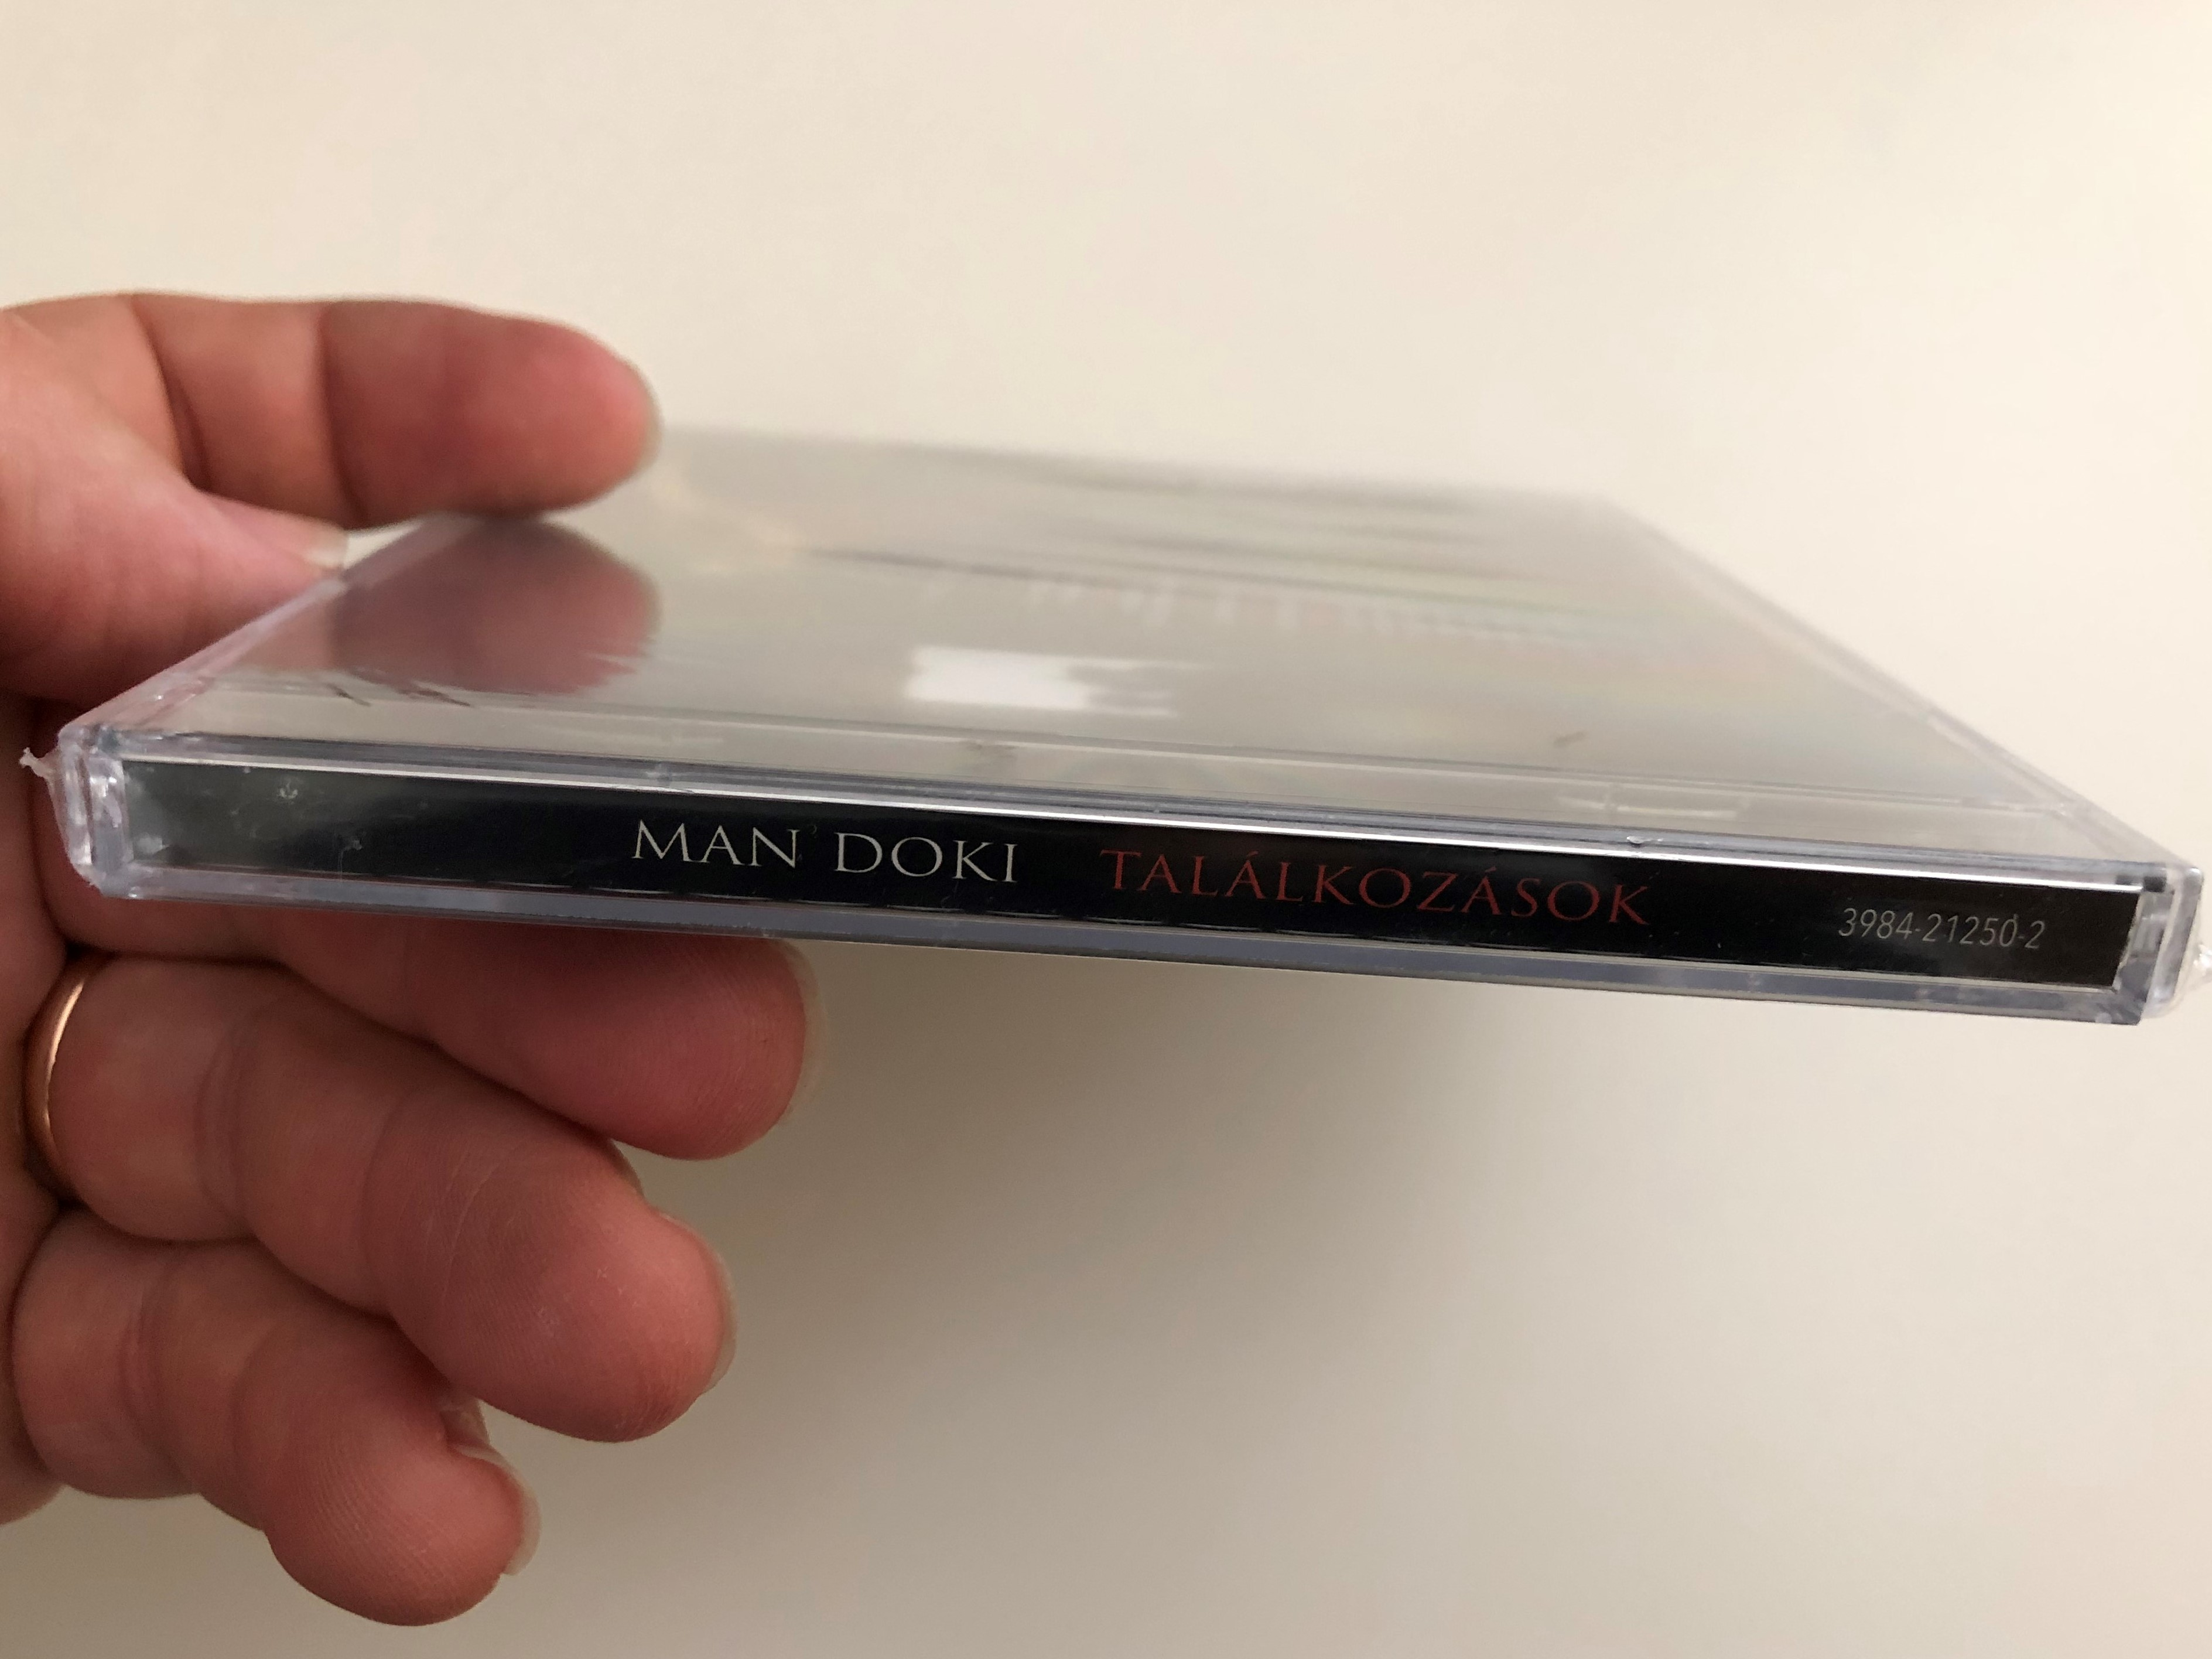 man-doki-charlie-demj-n-ferenc-zor-n-soml-tam-s-cserh-ti-zsuzsa-tal-lkoz-sok-magneoton-audio-cd-1997-3984-21250-2-2-.jpg